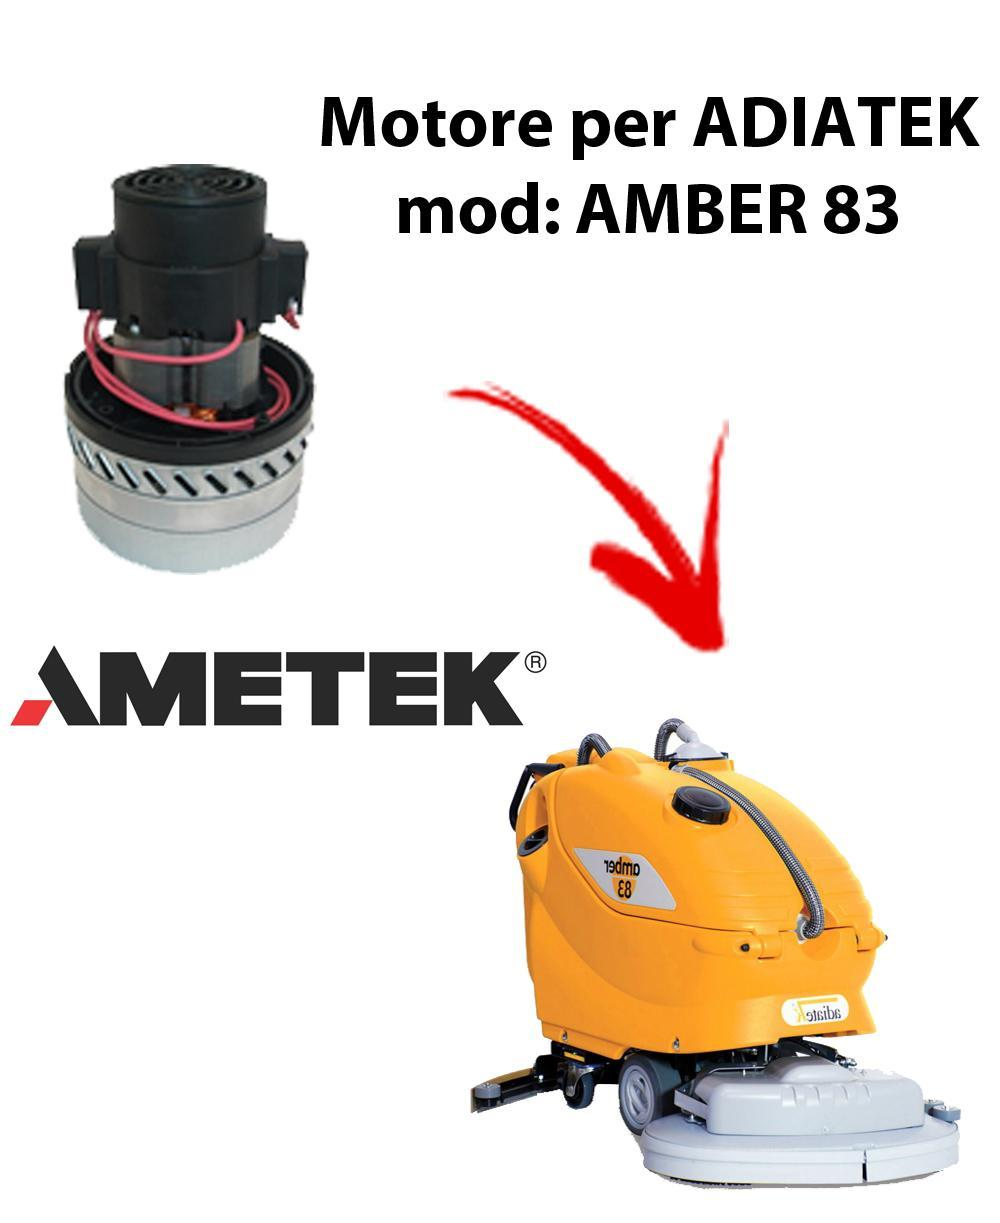 Amber 83 -  Motore de aspiración Ametek Italia  para fregadora Adiatek